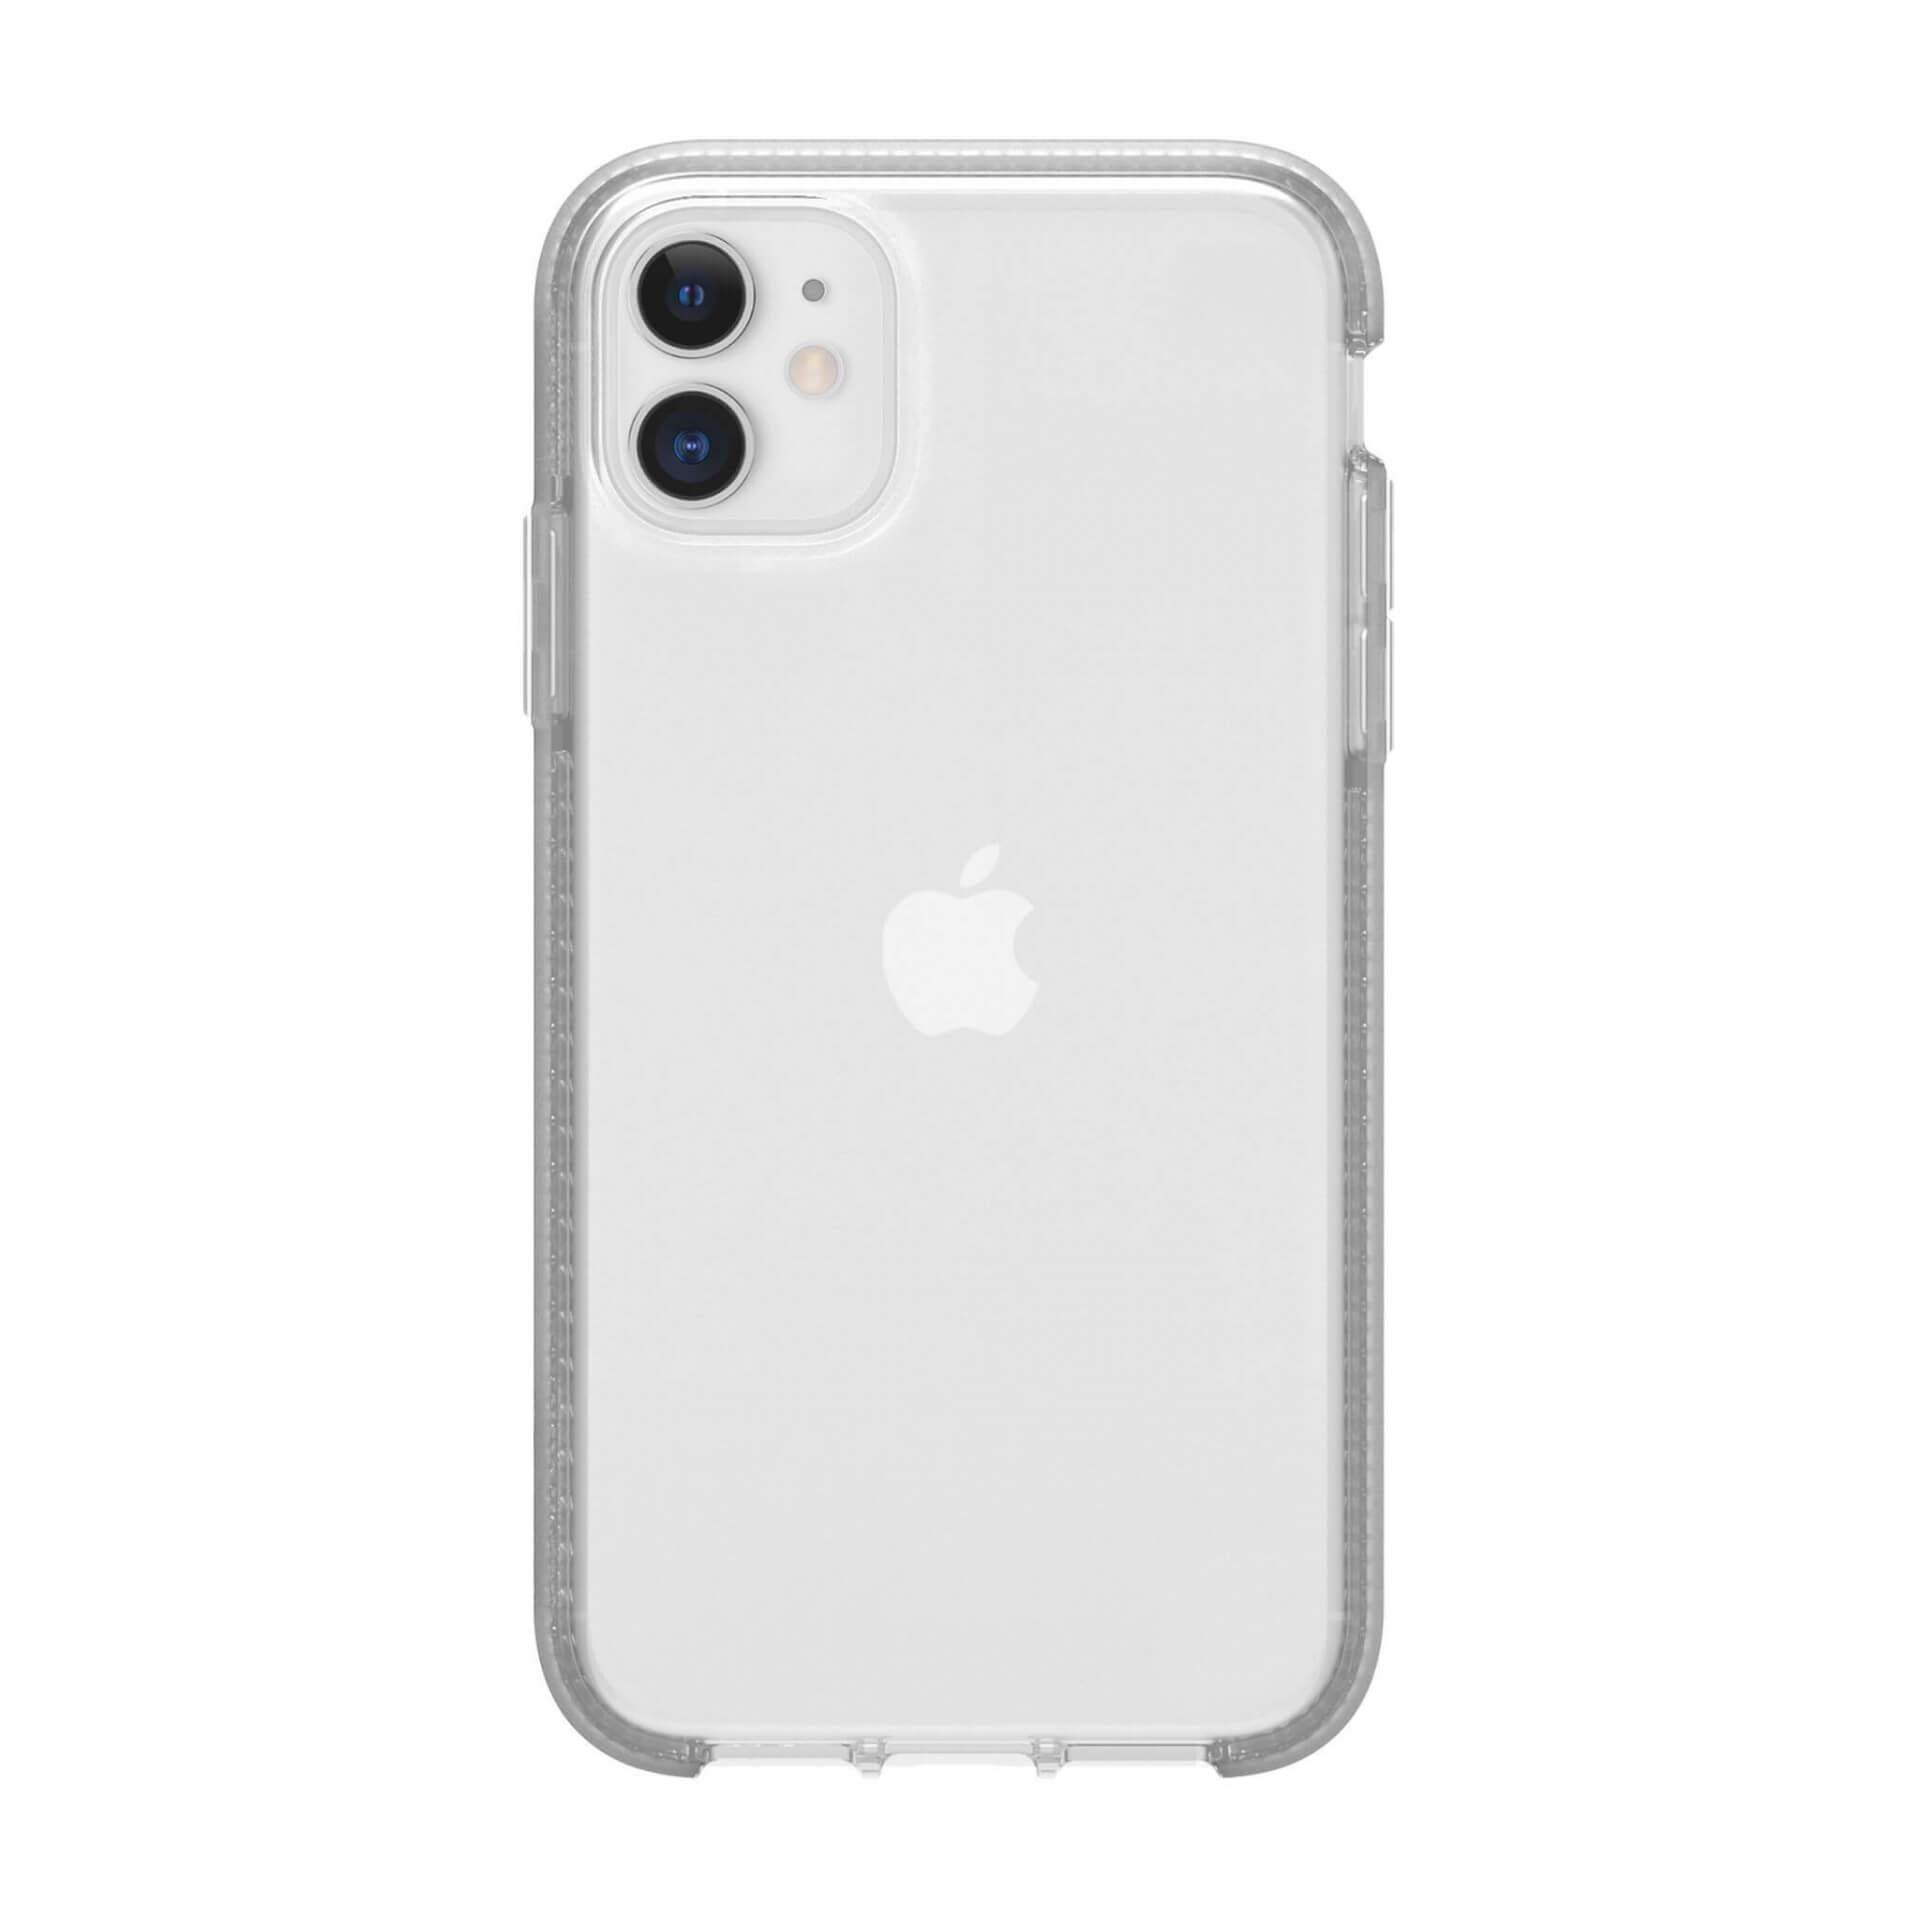 Griffin Survivor Clear Case — хибриден удароустойчив кейс за iPhone 11 (прозрачен) - 3